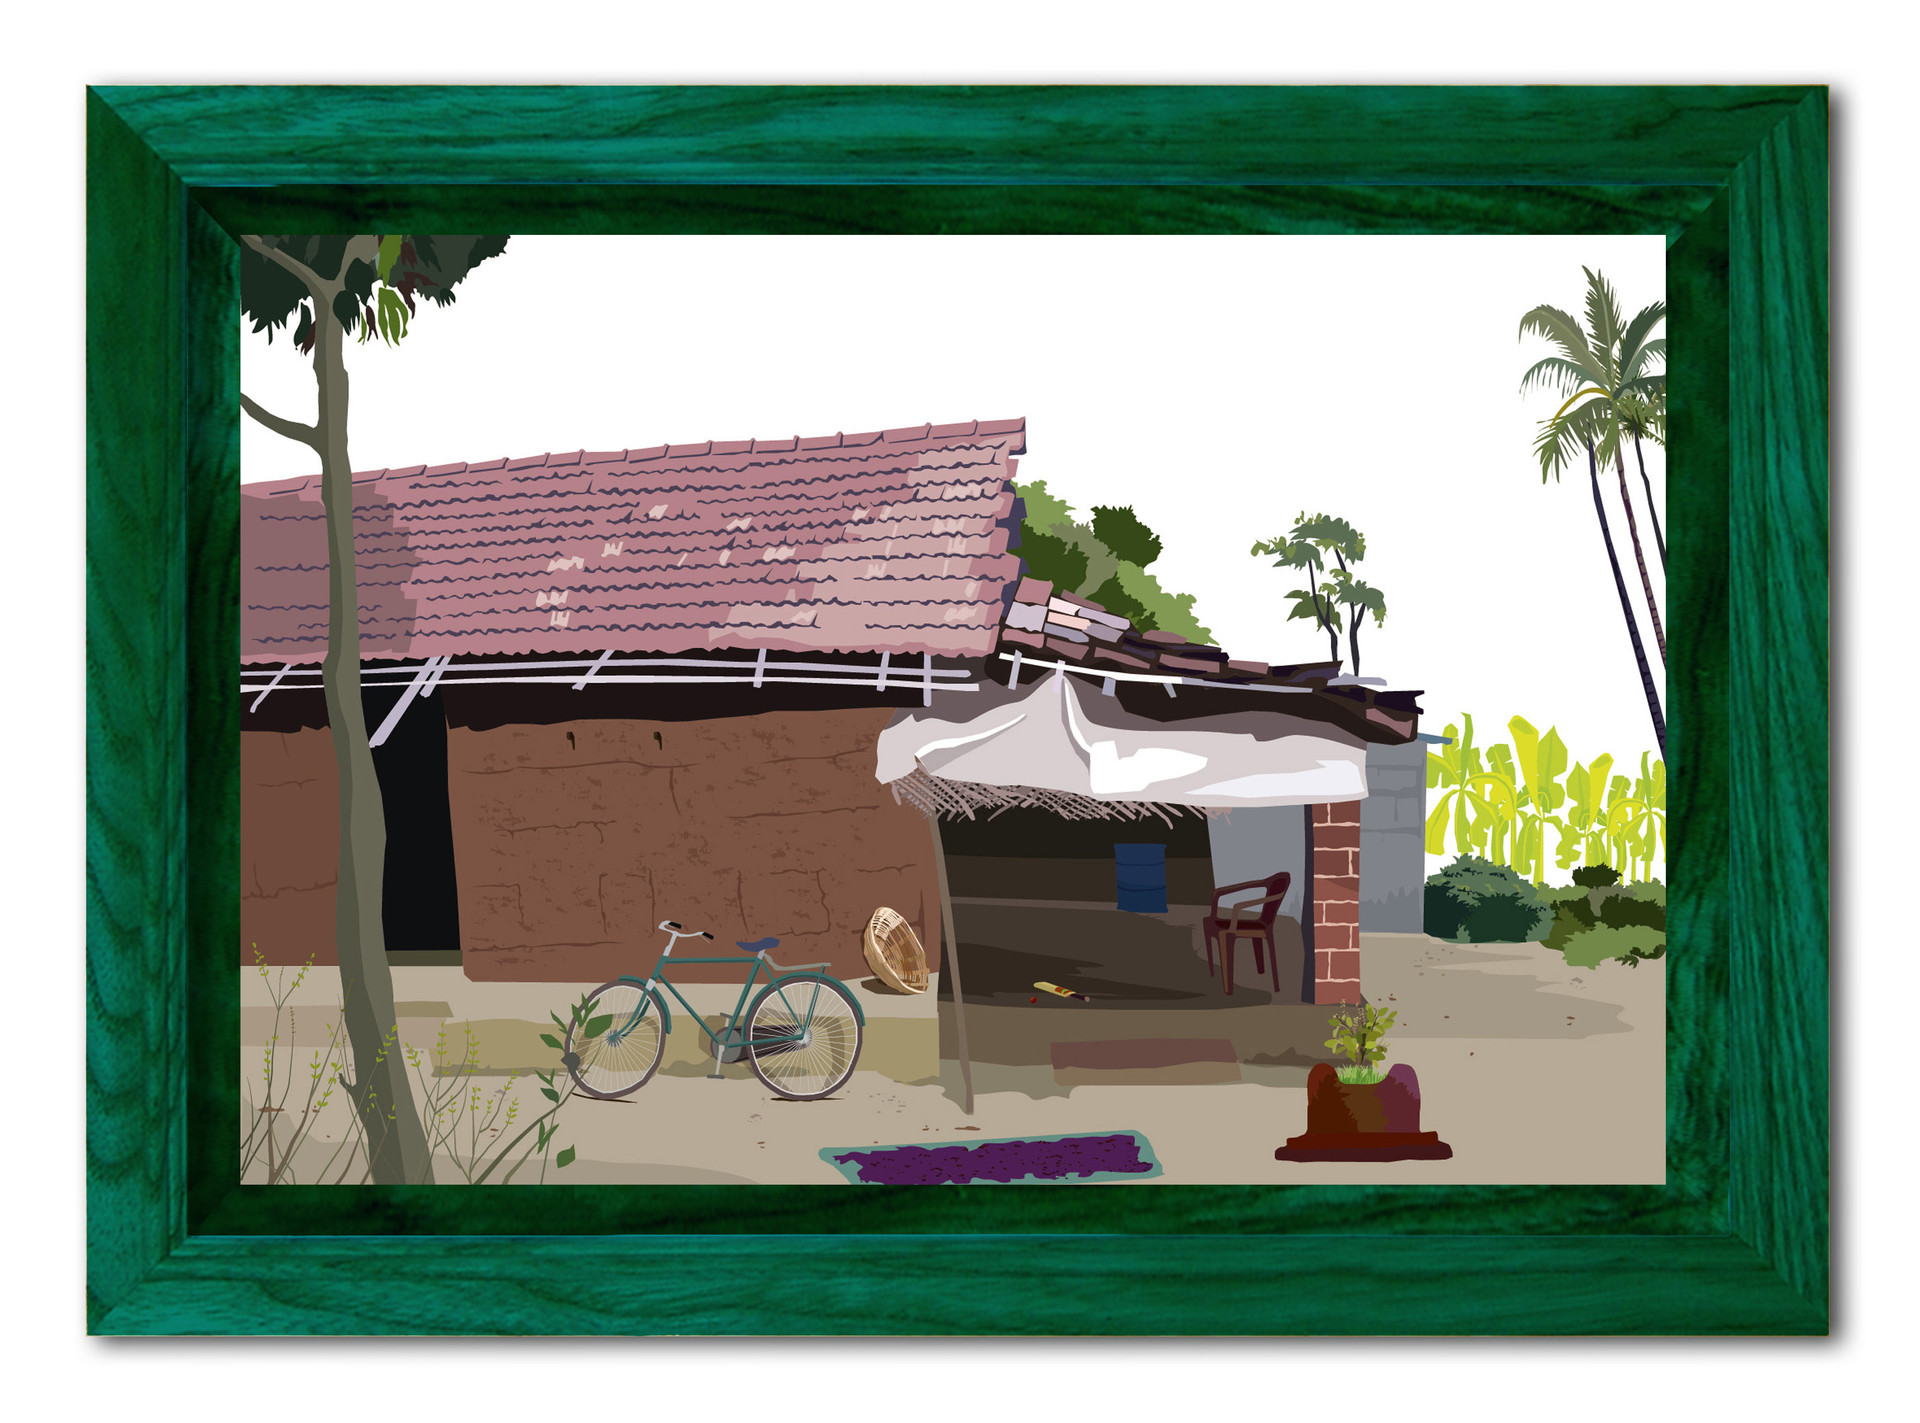 Rajesh r sawant vadkol mausi house